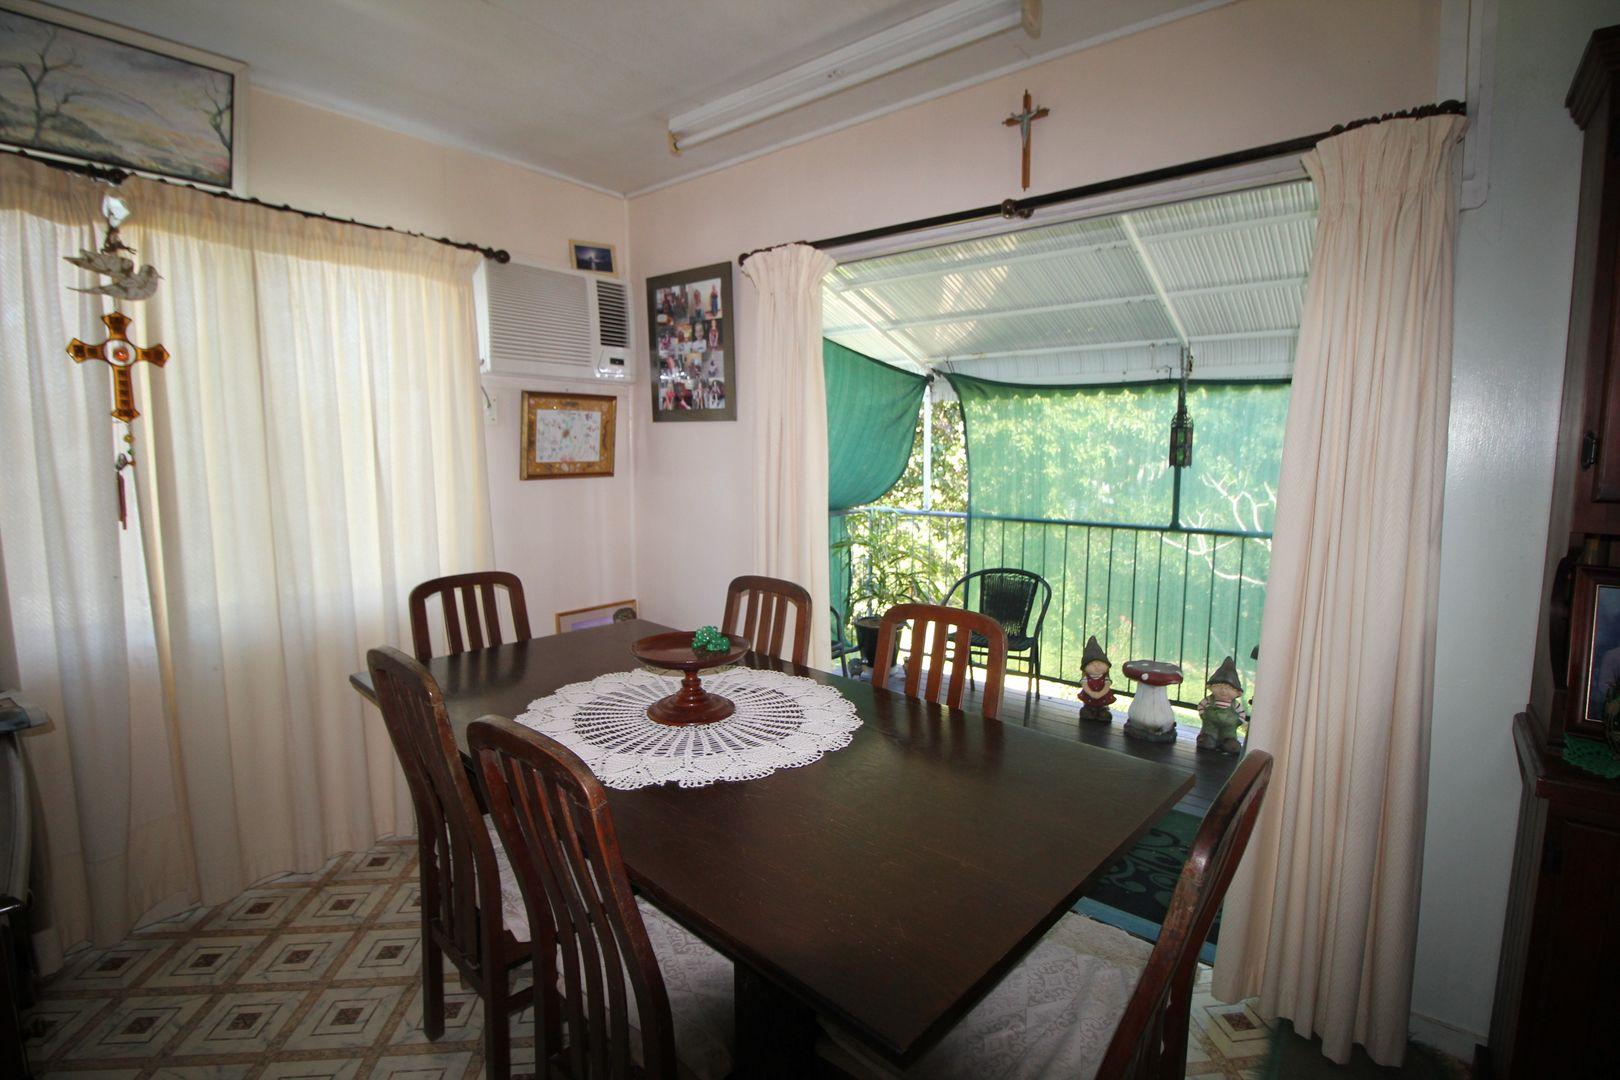 464 Sunnybank Road, Braemeadows QLD 4850, Image 2